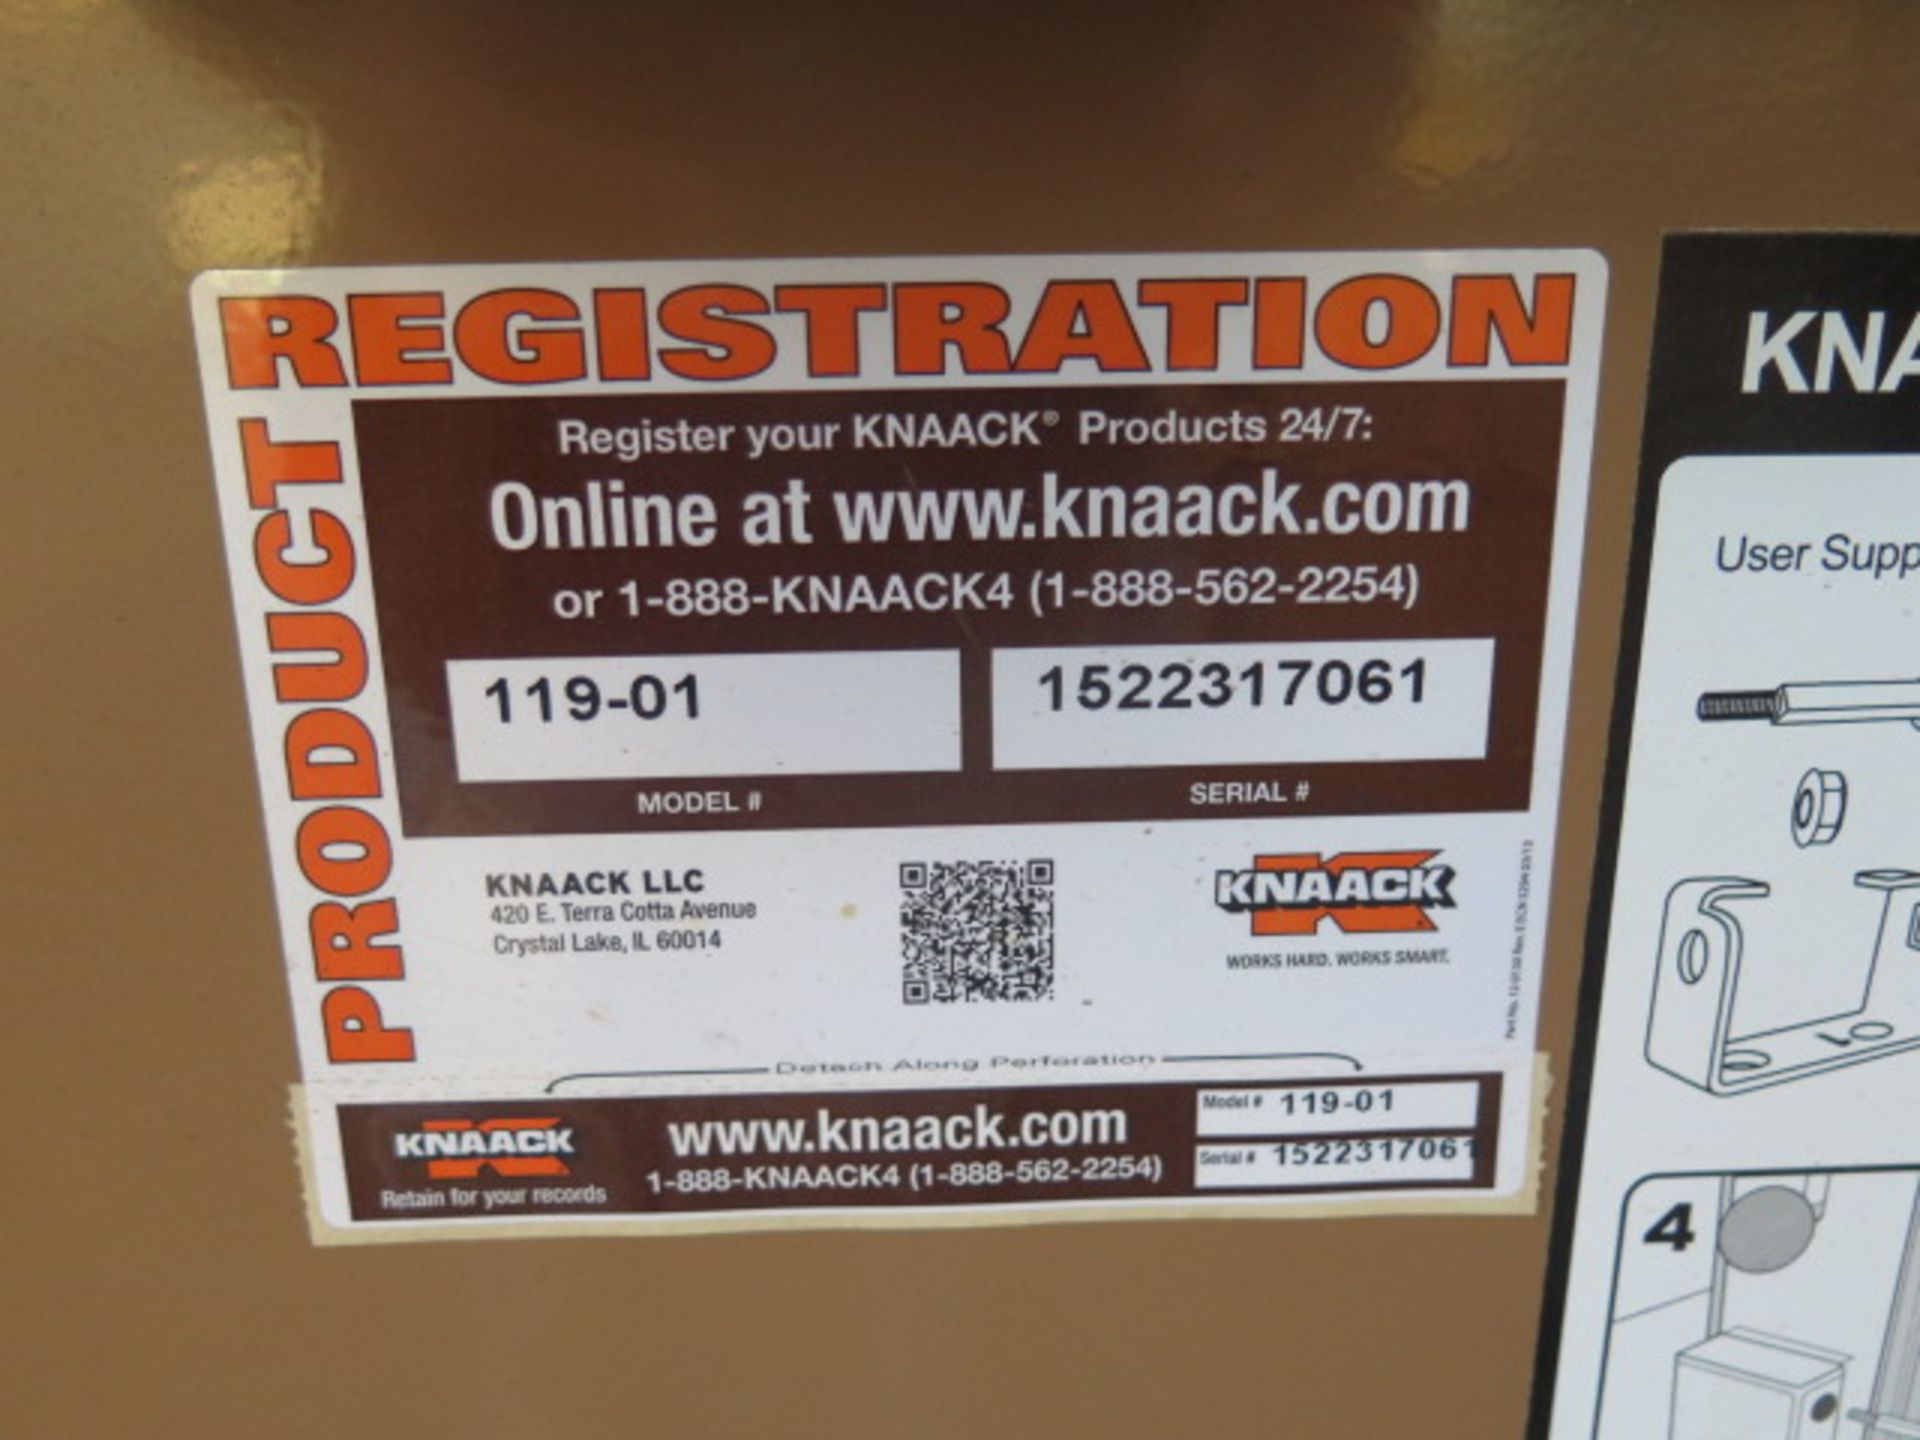 Knaack mdl. 119-01 Rolling Job Box (SOLD AS-IS - NO WARRANTY) - Image 7 of 7